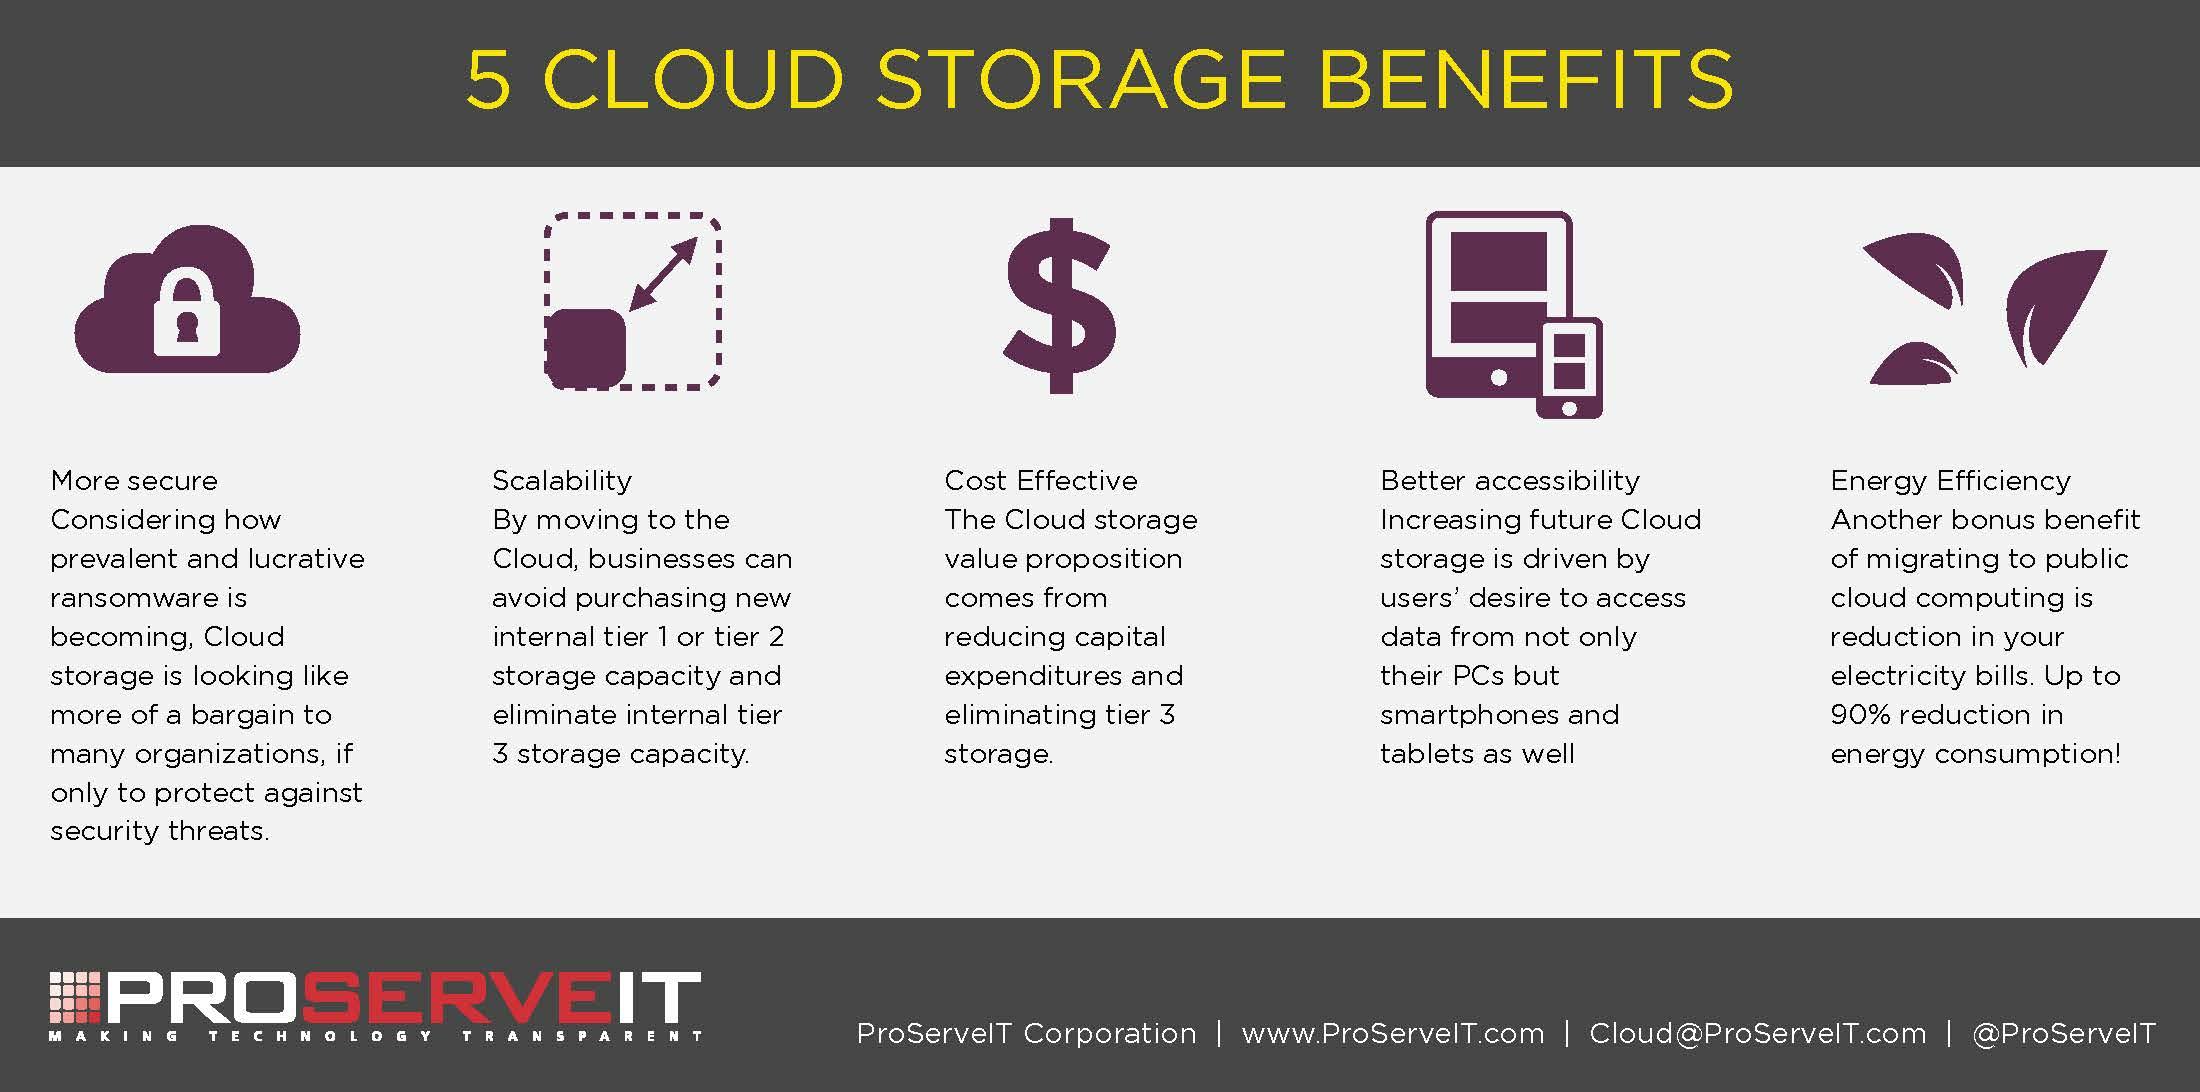 final-5 cloud storage benefits (1)